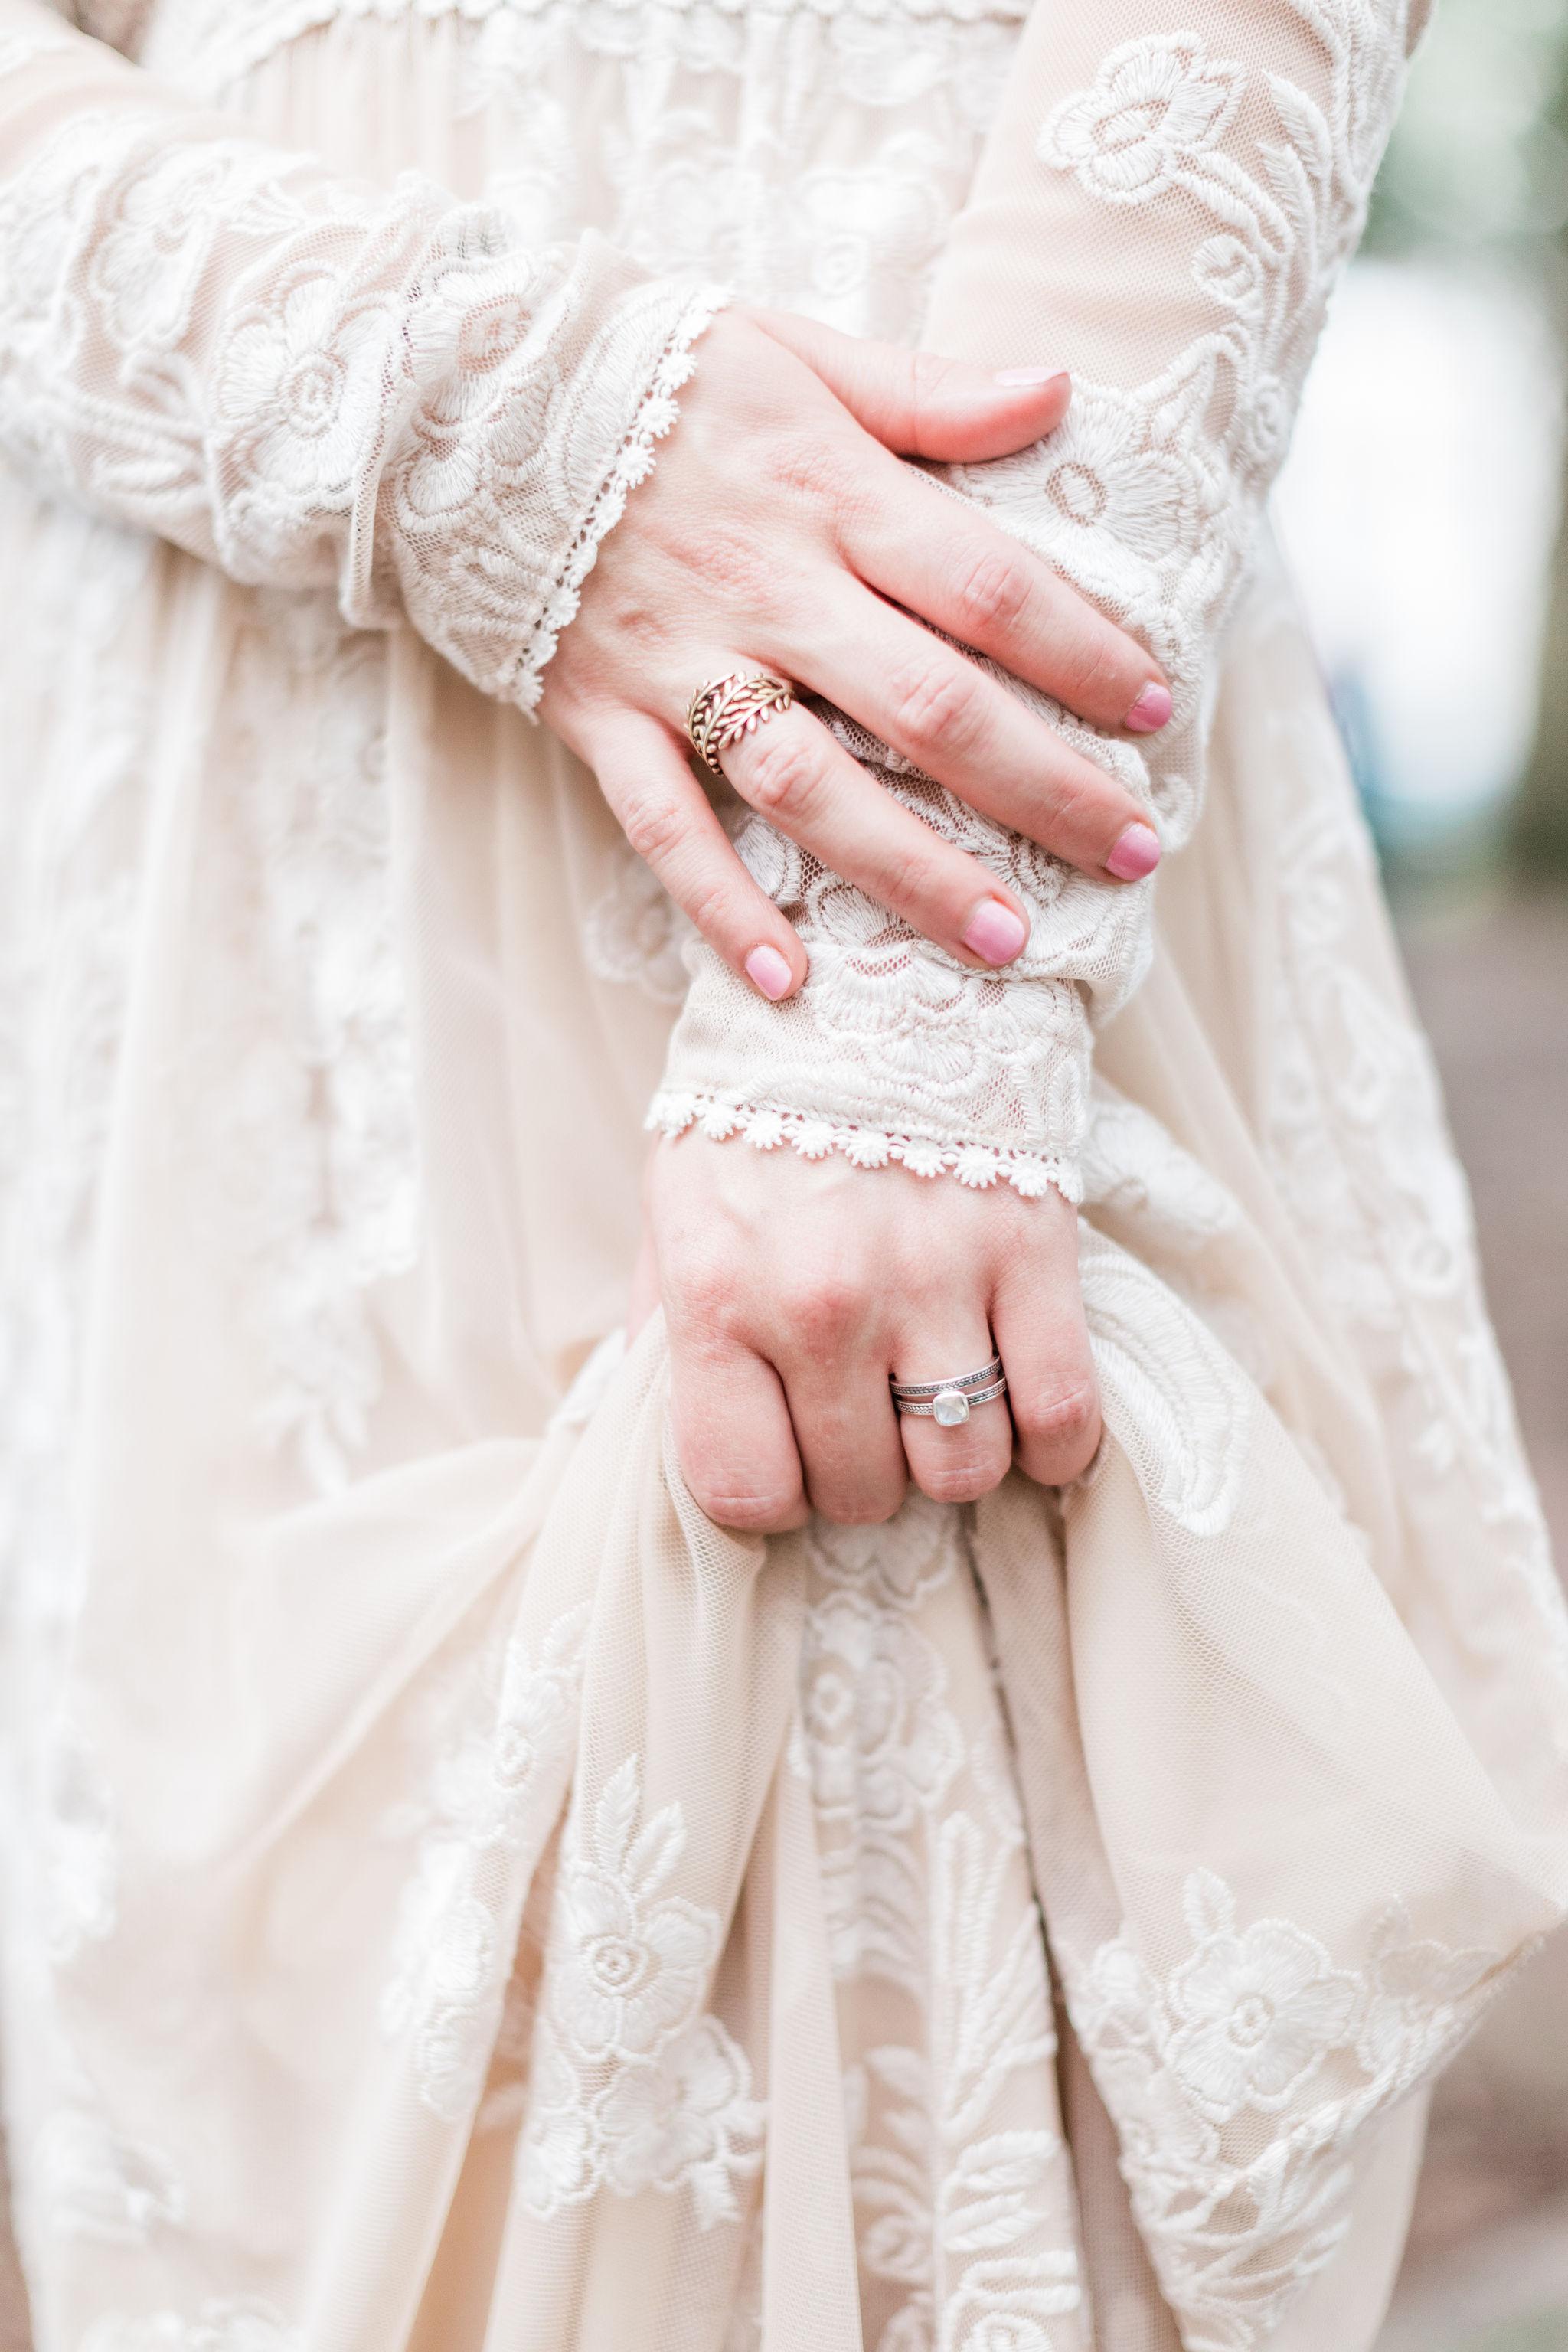 Rachael + Eric - Savannah Elopement in Lafayette Square | BHLDN Wedding Dress | Apt. B Photography